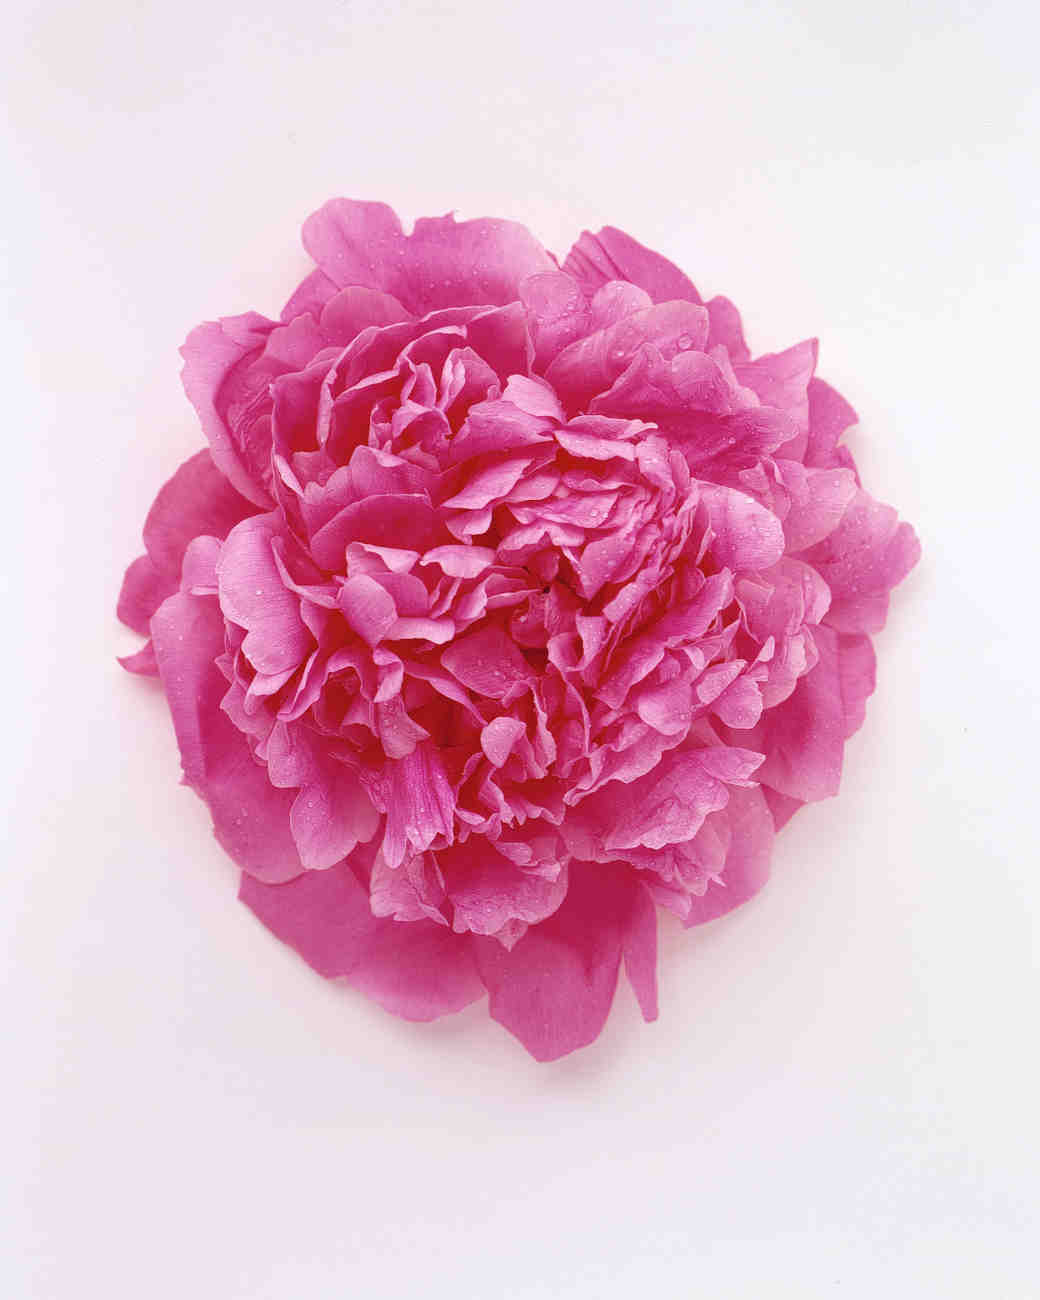 flower-glossary-peony-pink-hot-a98432-0415.jpg